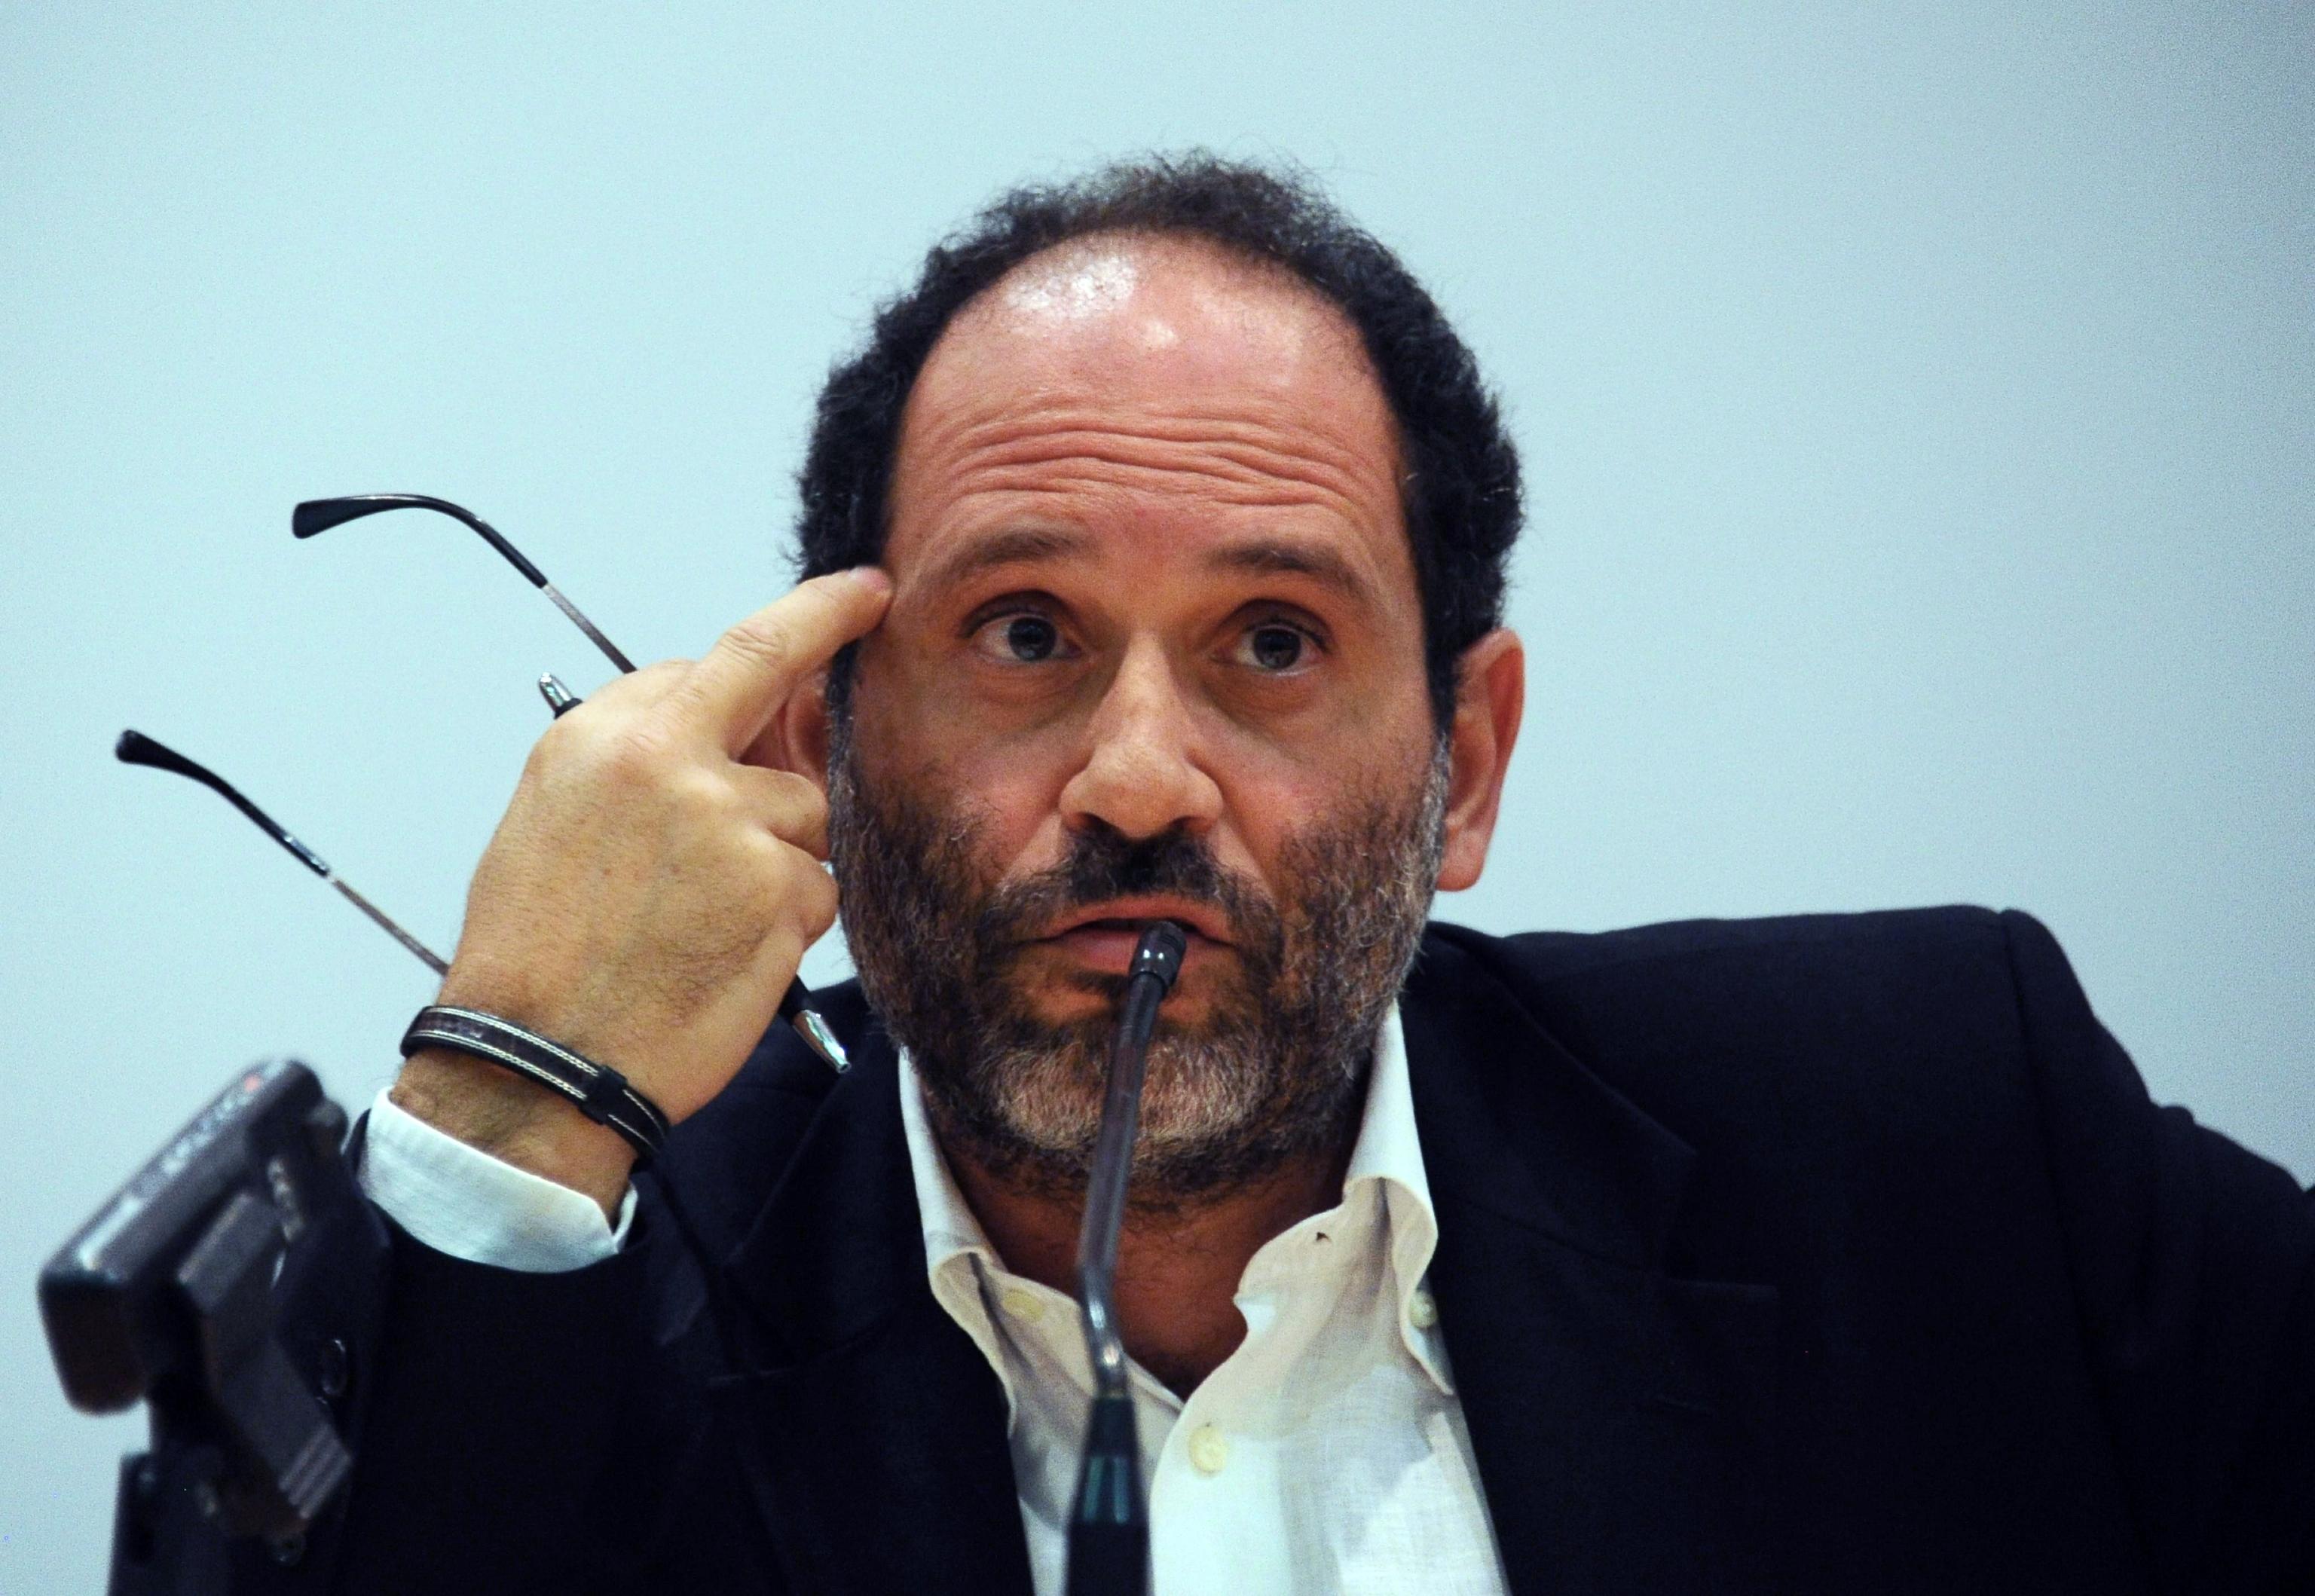 Antonio amodeo blog intervista a antonio ingroia for Intervista sinonimo